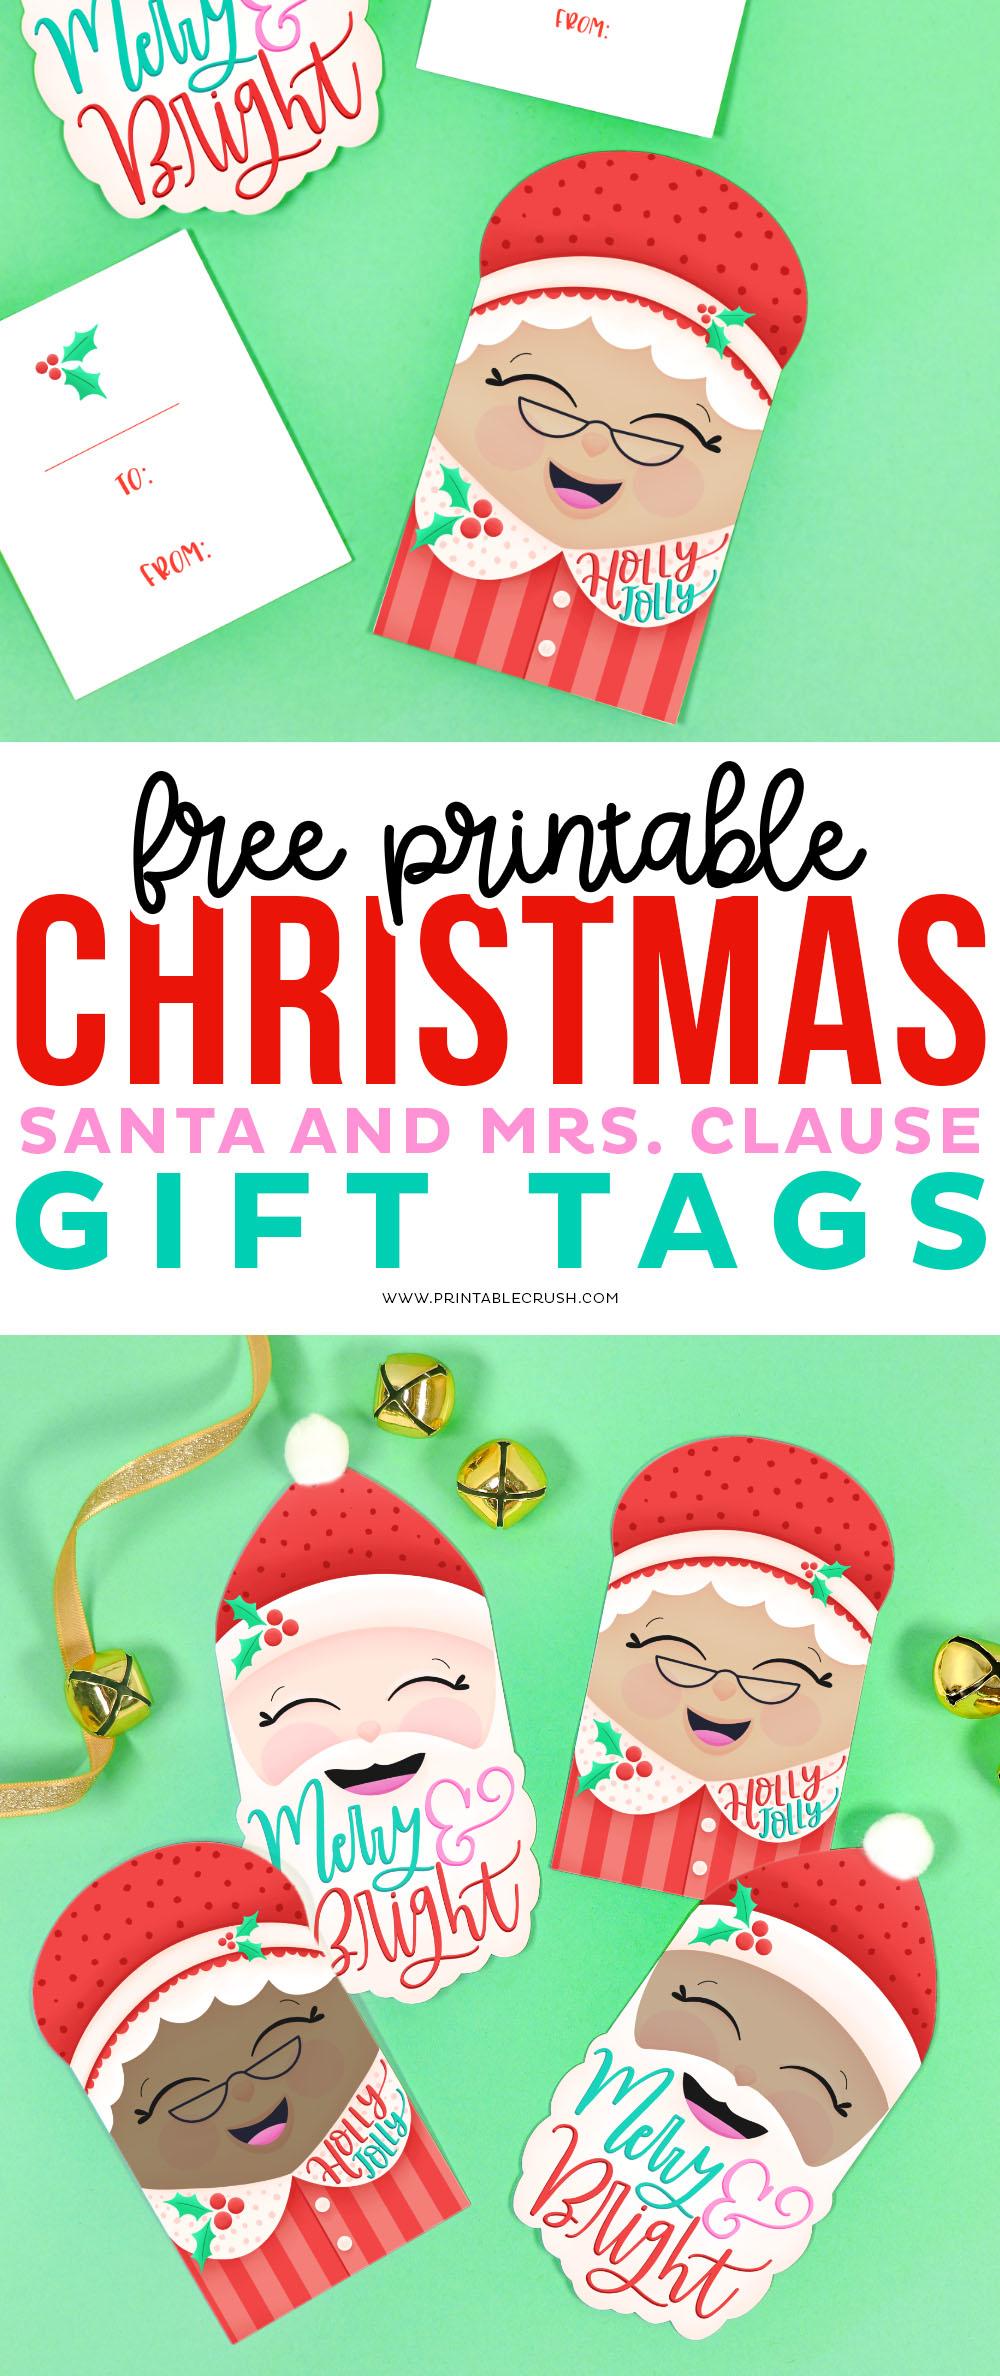 Free Santa and Mrs Claus Gift Tags - Printable Crush via @printablecrush